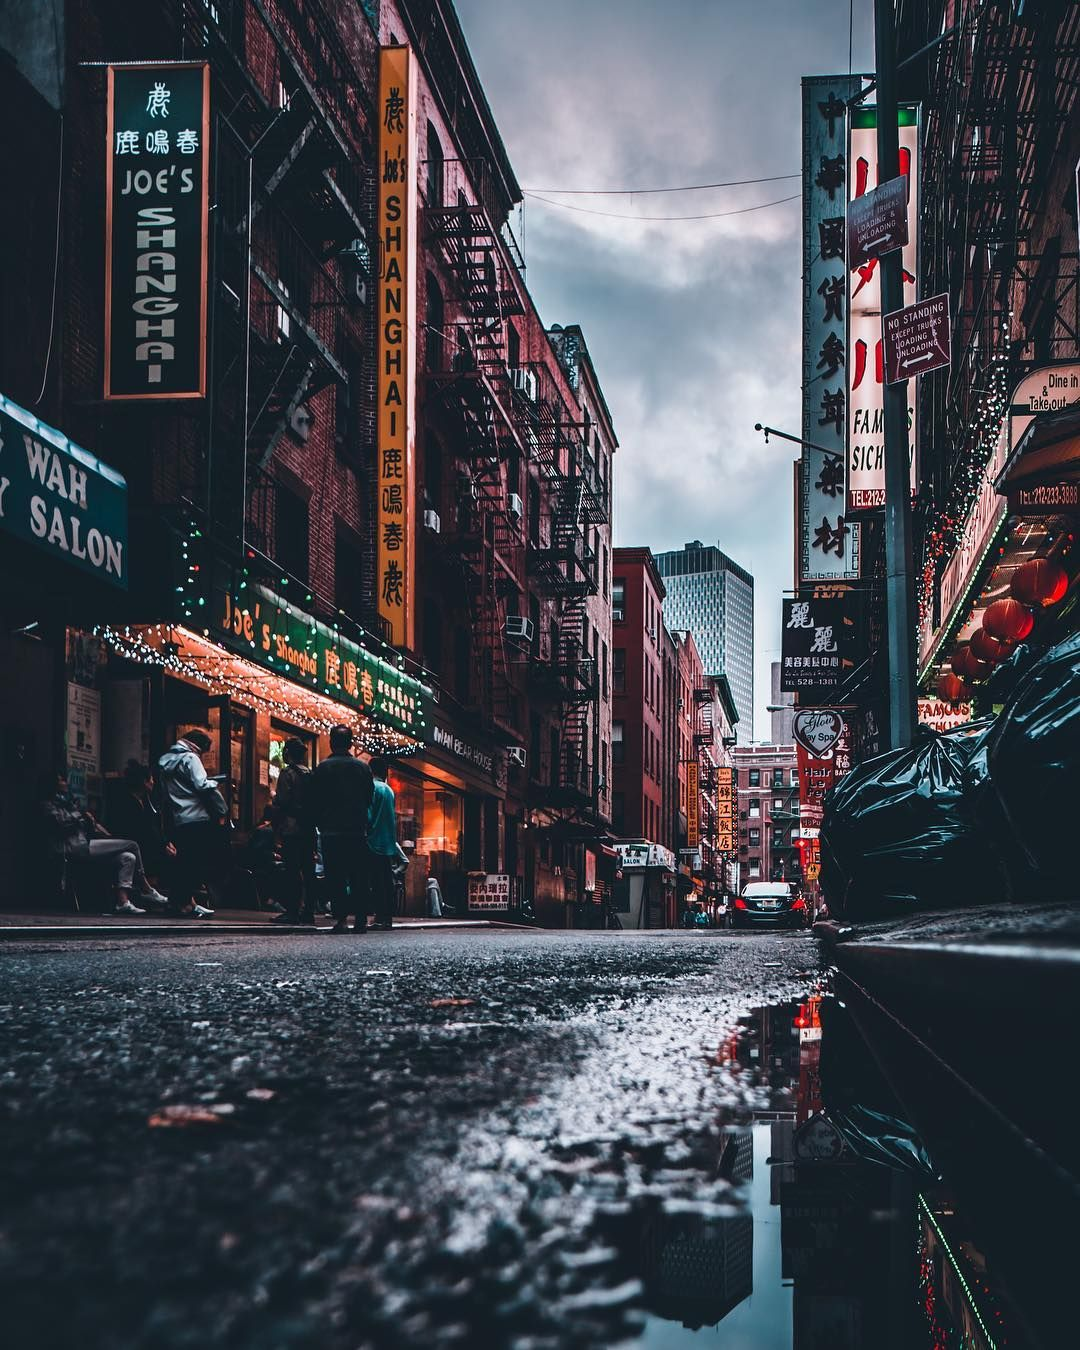 Stunning Moody Street Photos Of New York City By Mazz